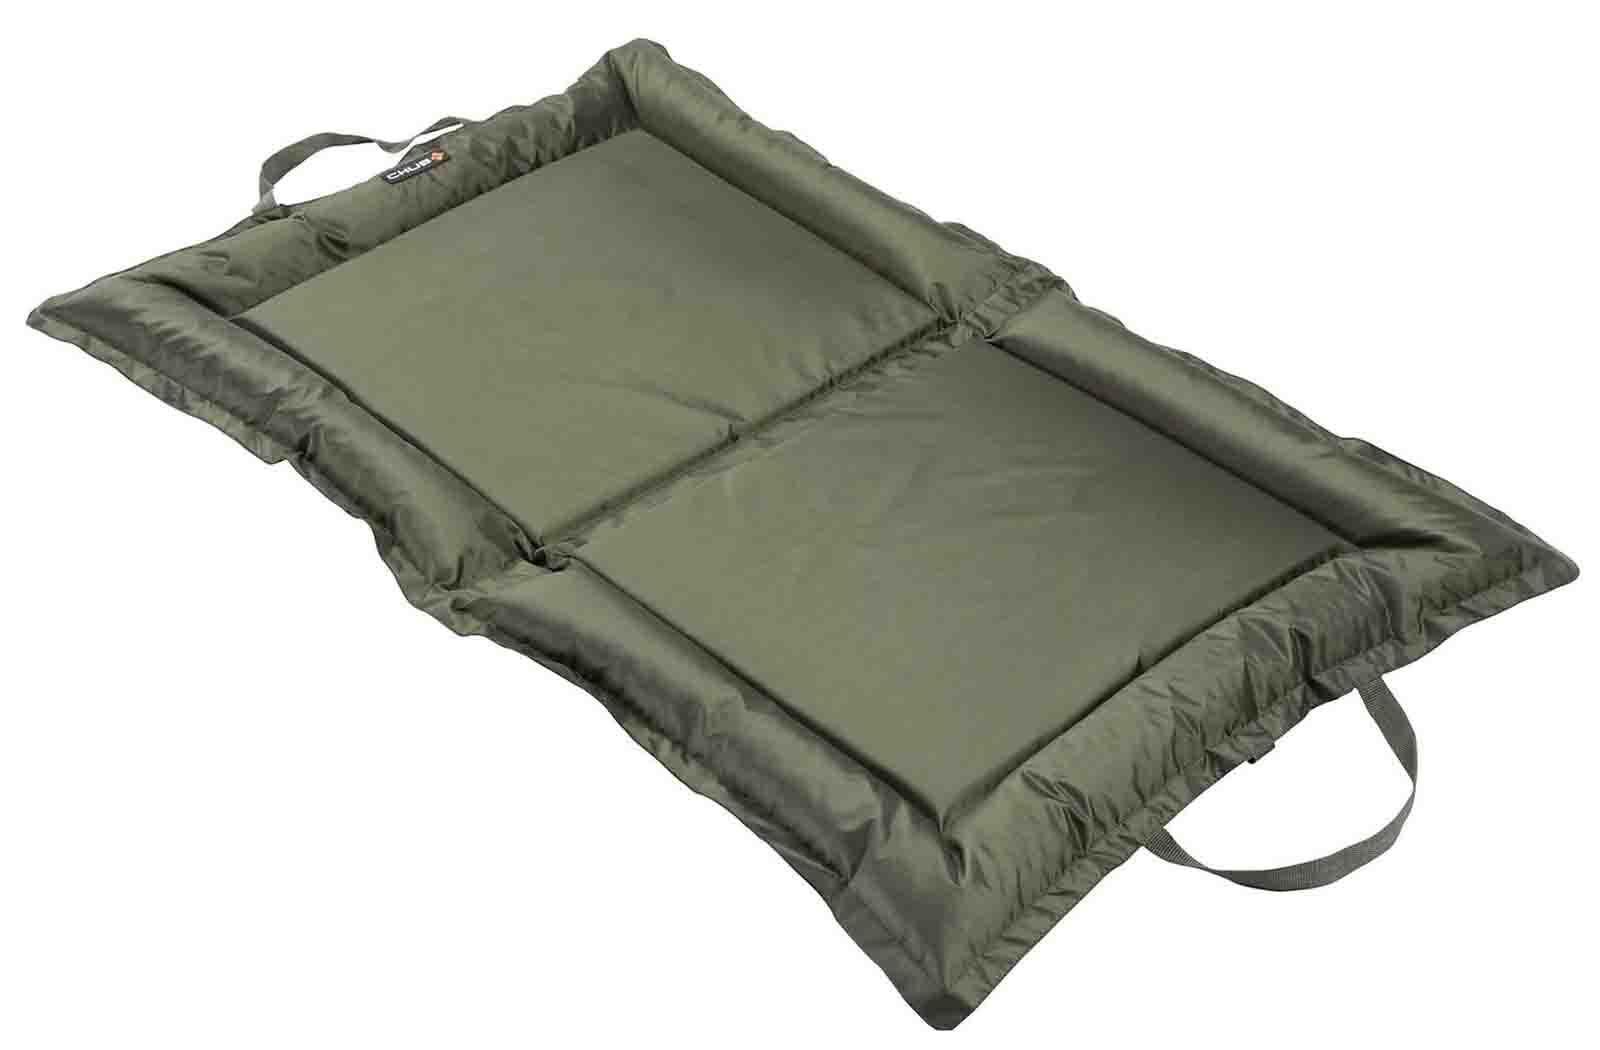 CHUB X-TRA Predection Beanie Mat Compact   Carp Coarse Fishing Unhooking Mat